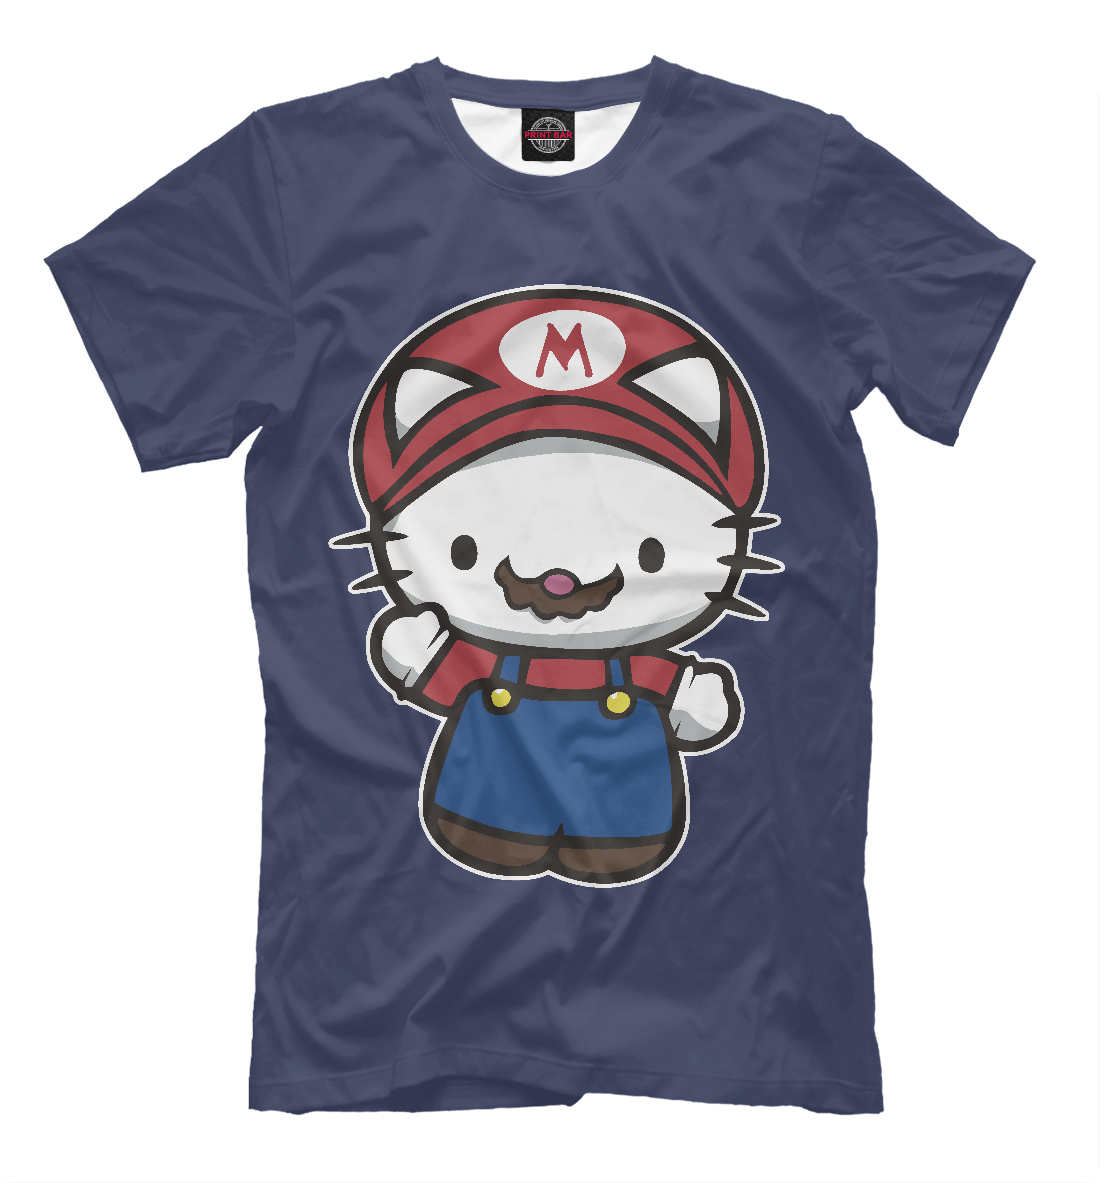 Купить Kitty Mario, Printbar, Футболки, HLK-885717-fut-2